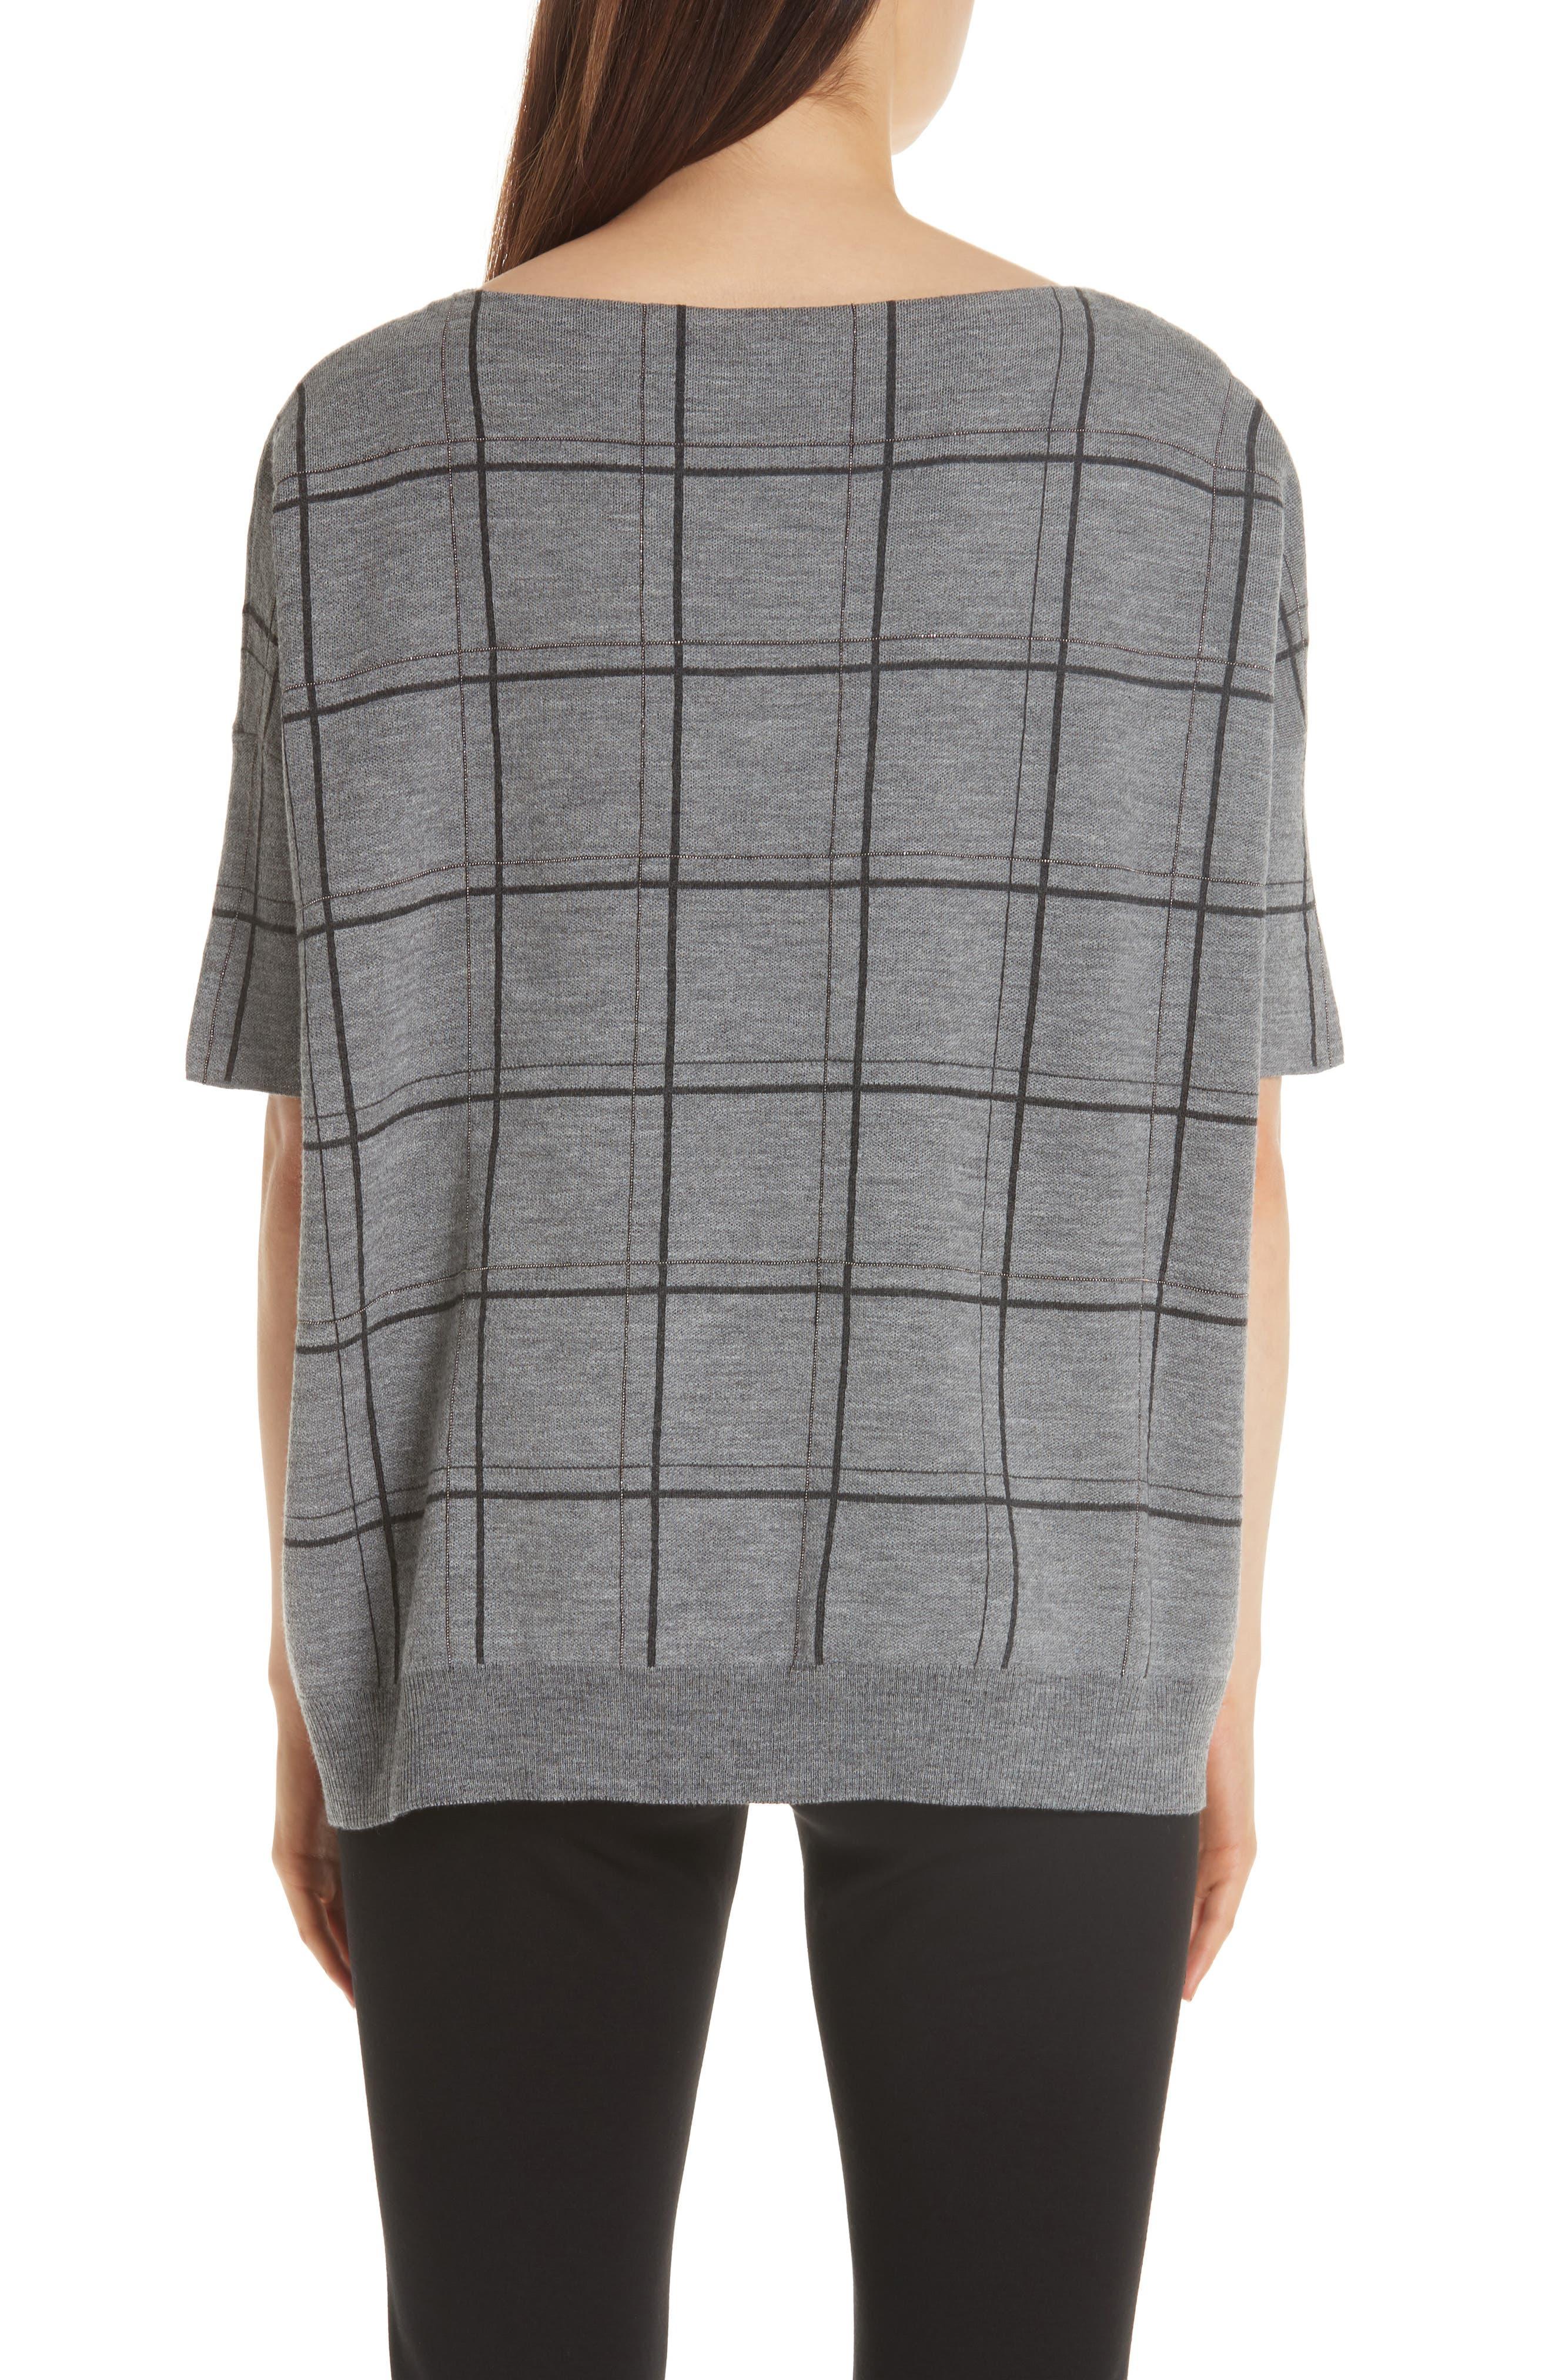 LAFAYETTE 148 NEW YORK,                             Chain Embellished Oversize Jacquard Sweater,                             Alternate thumbnail 2, color,                             056